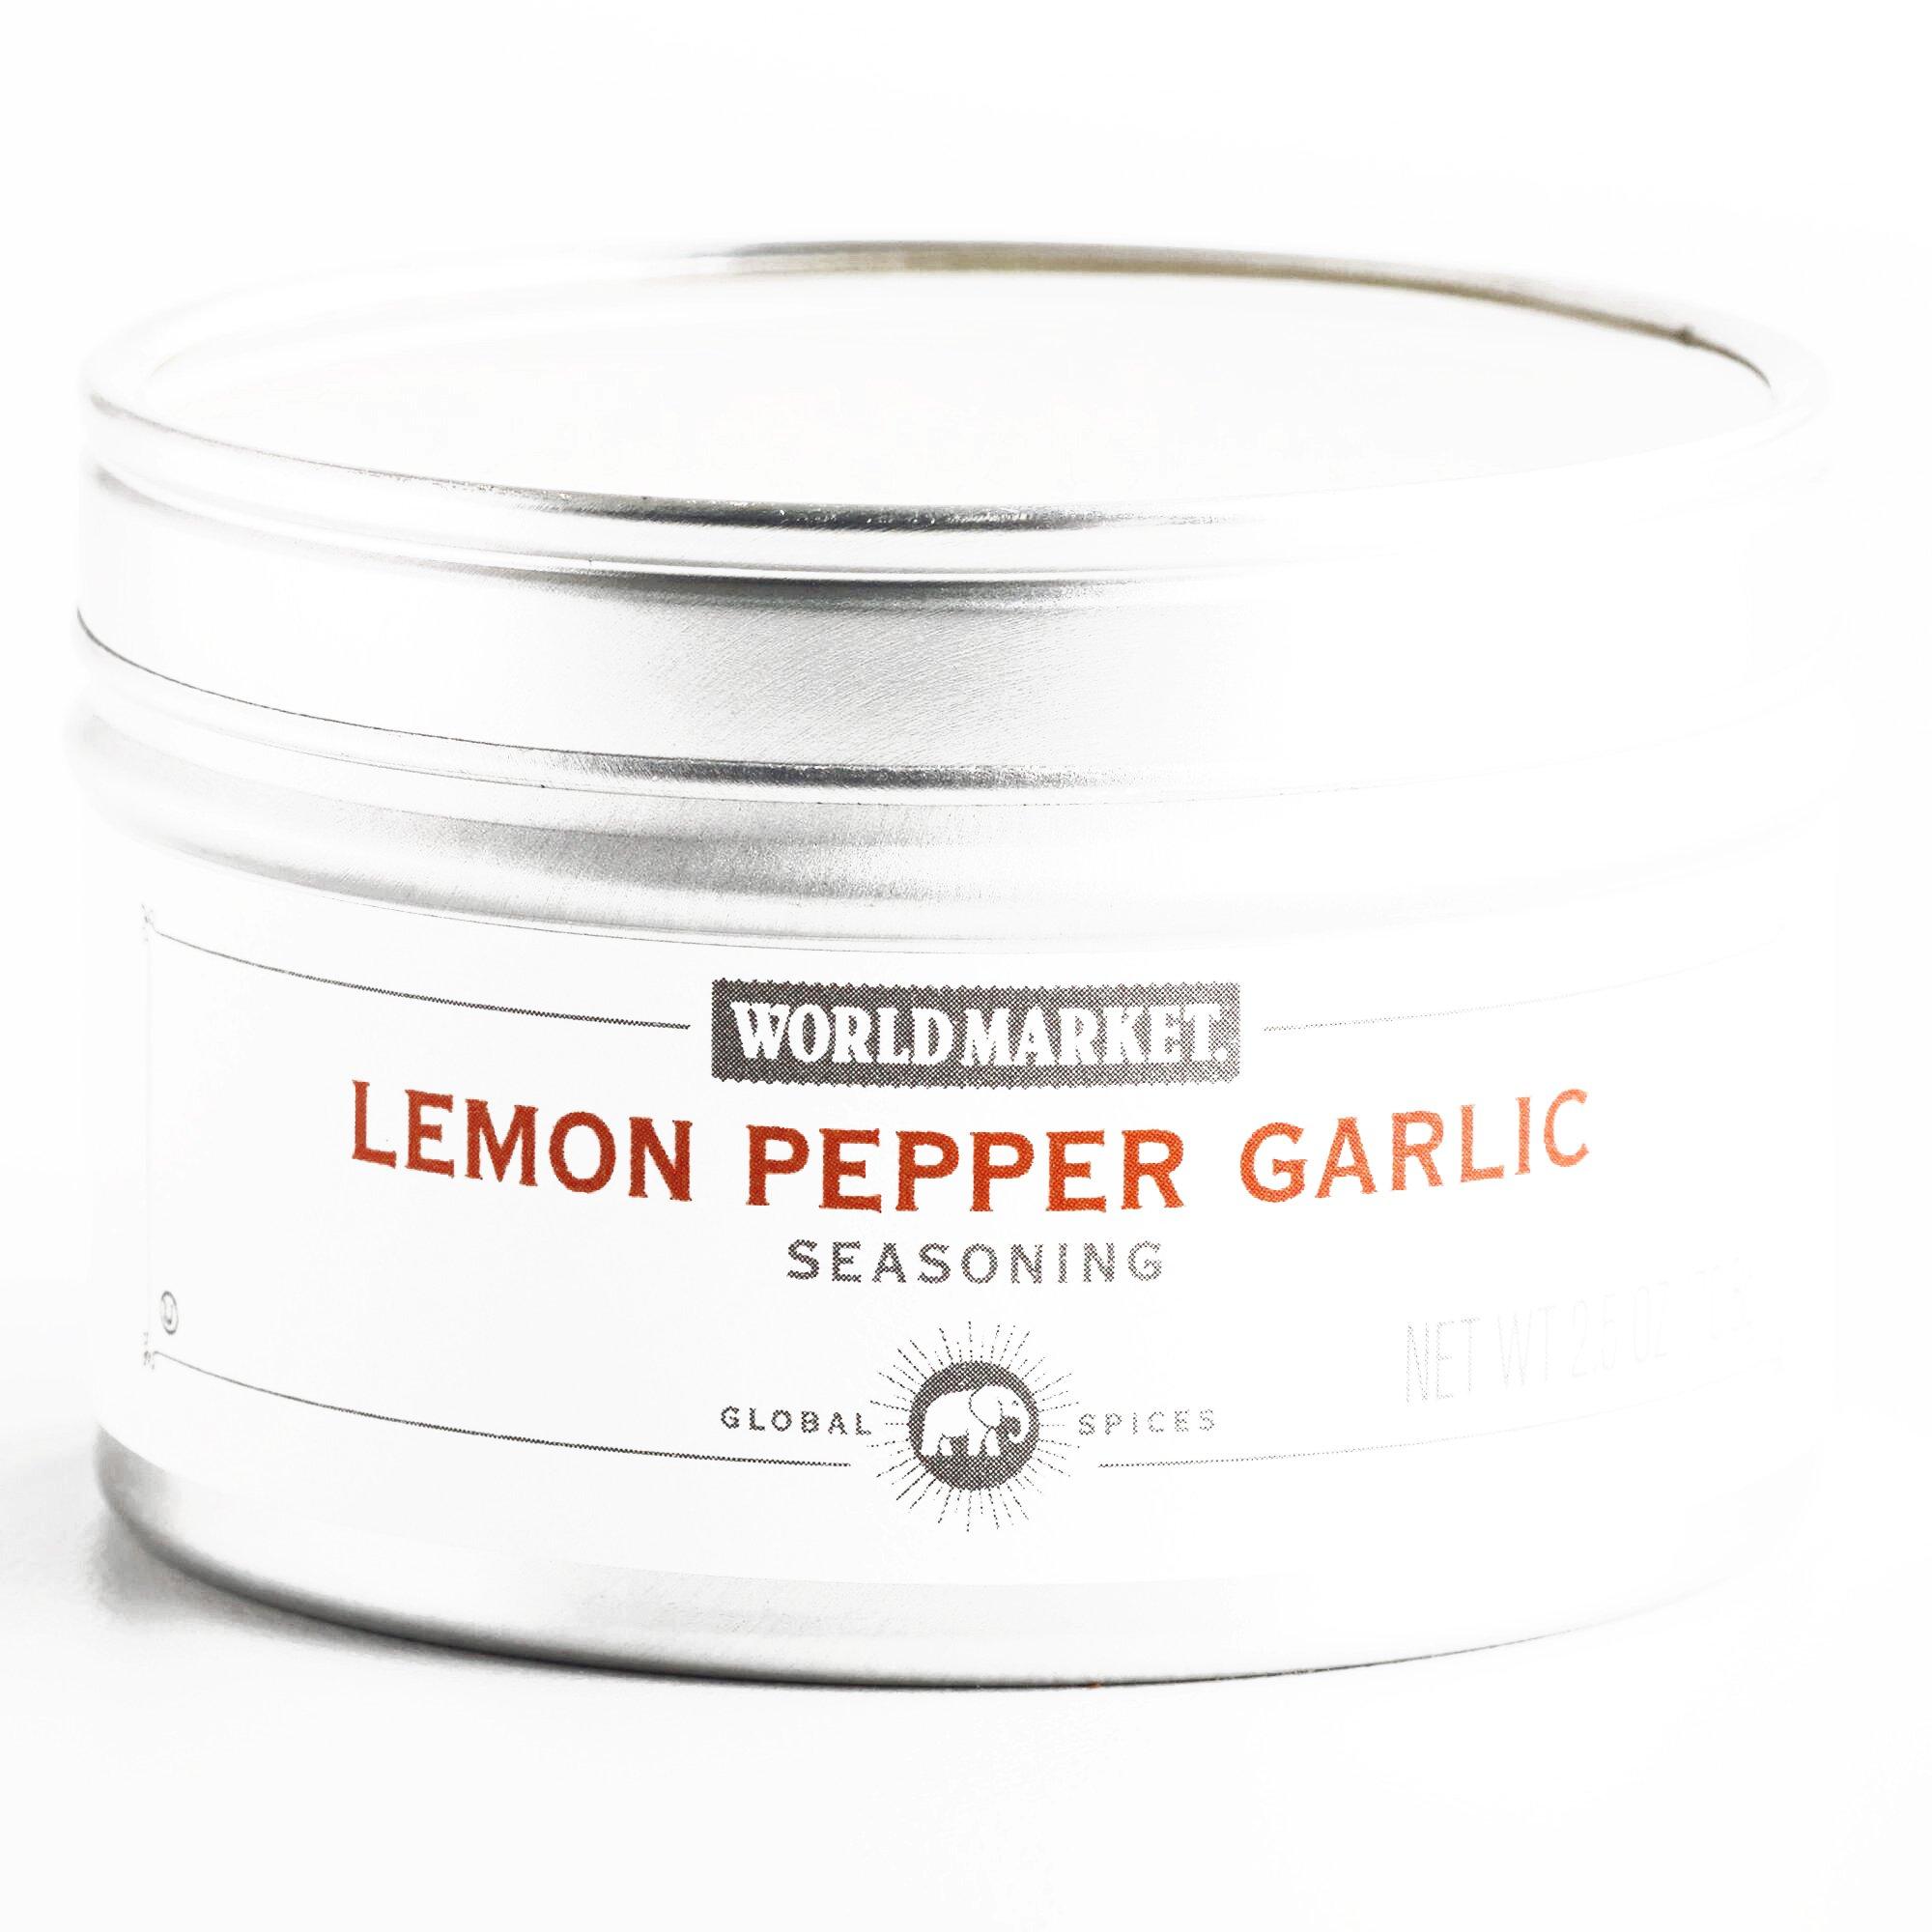 Lemon Pepper Seasoning 2.5 oz each (6 Items Per Order, not per case)